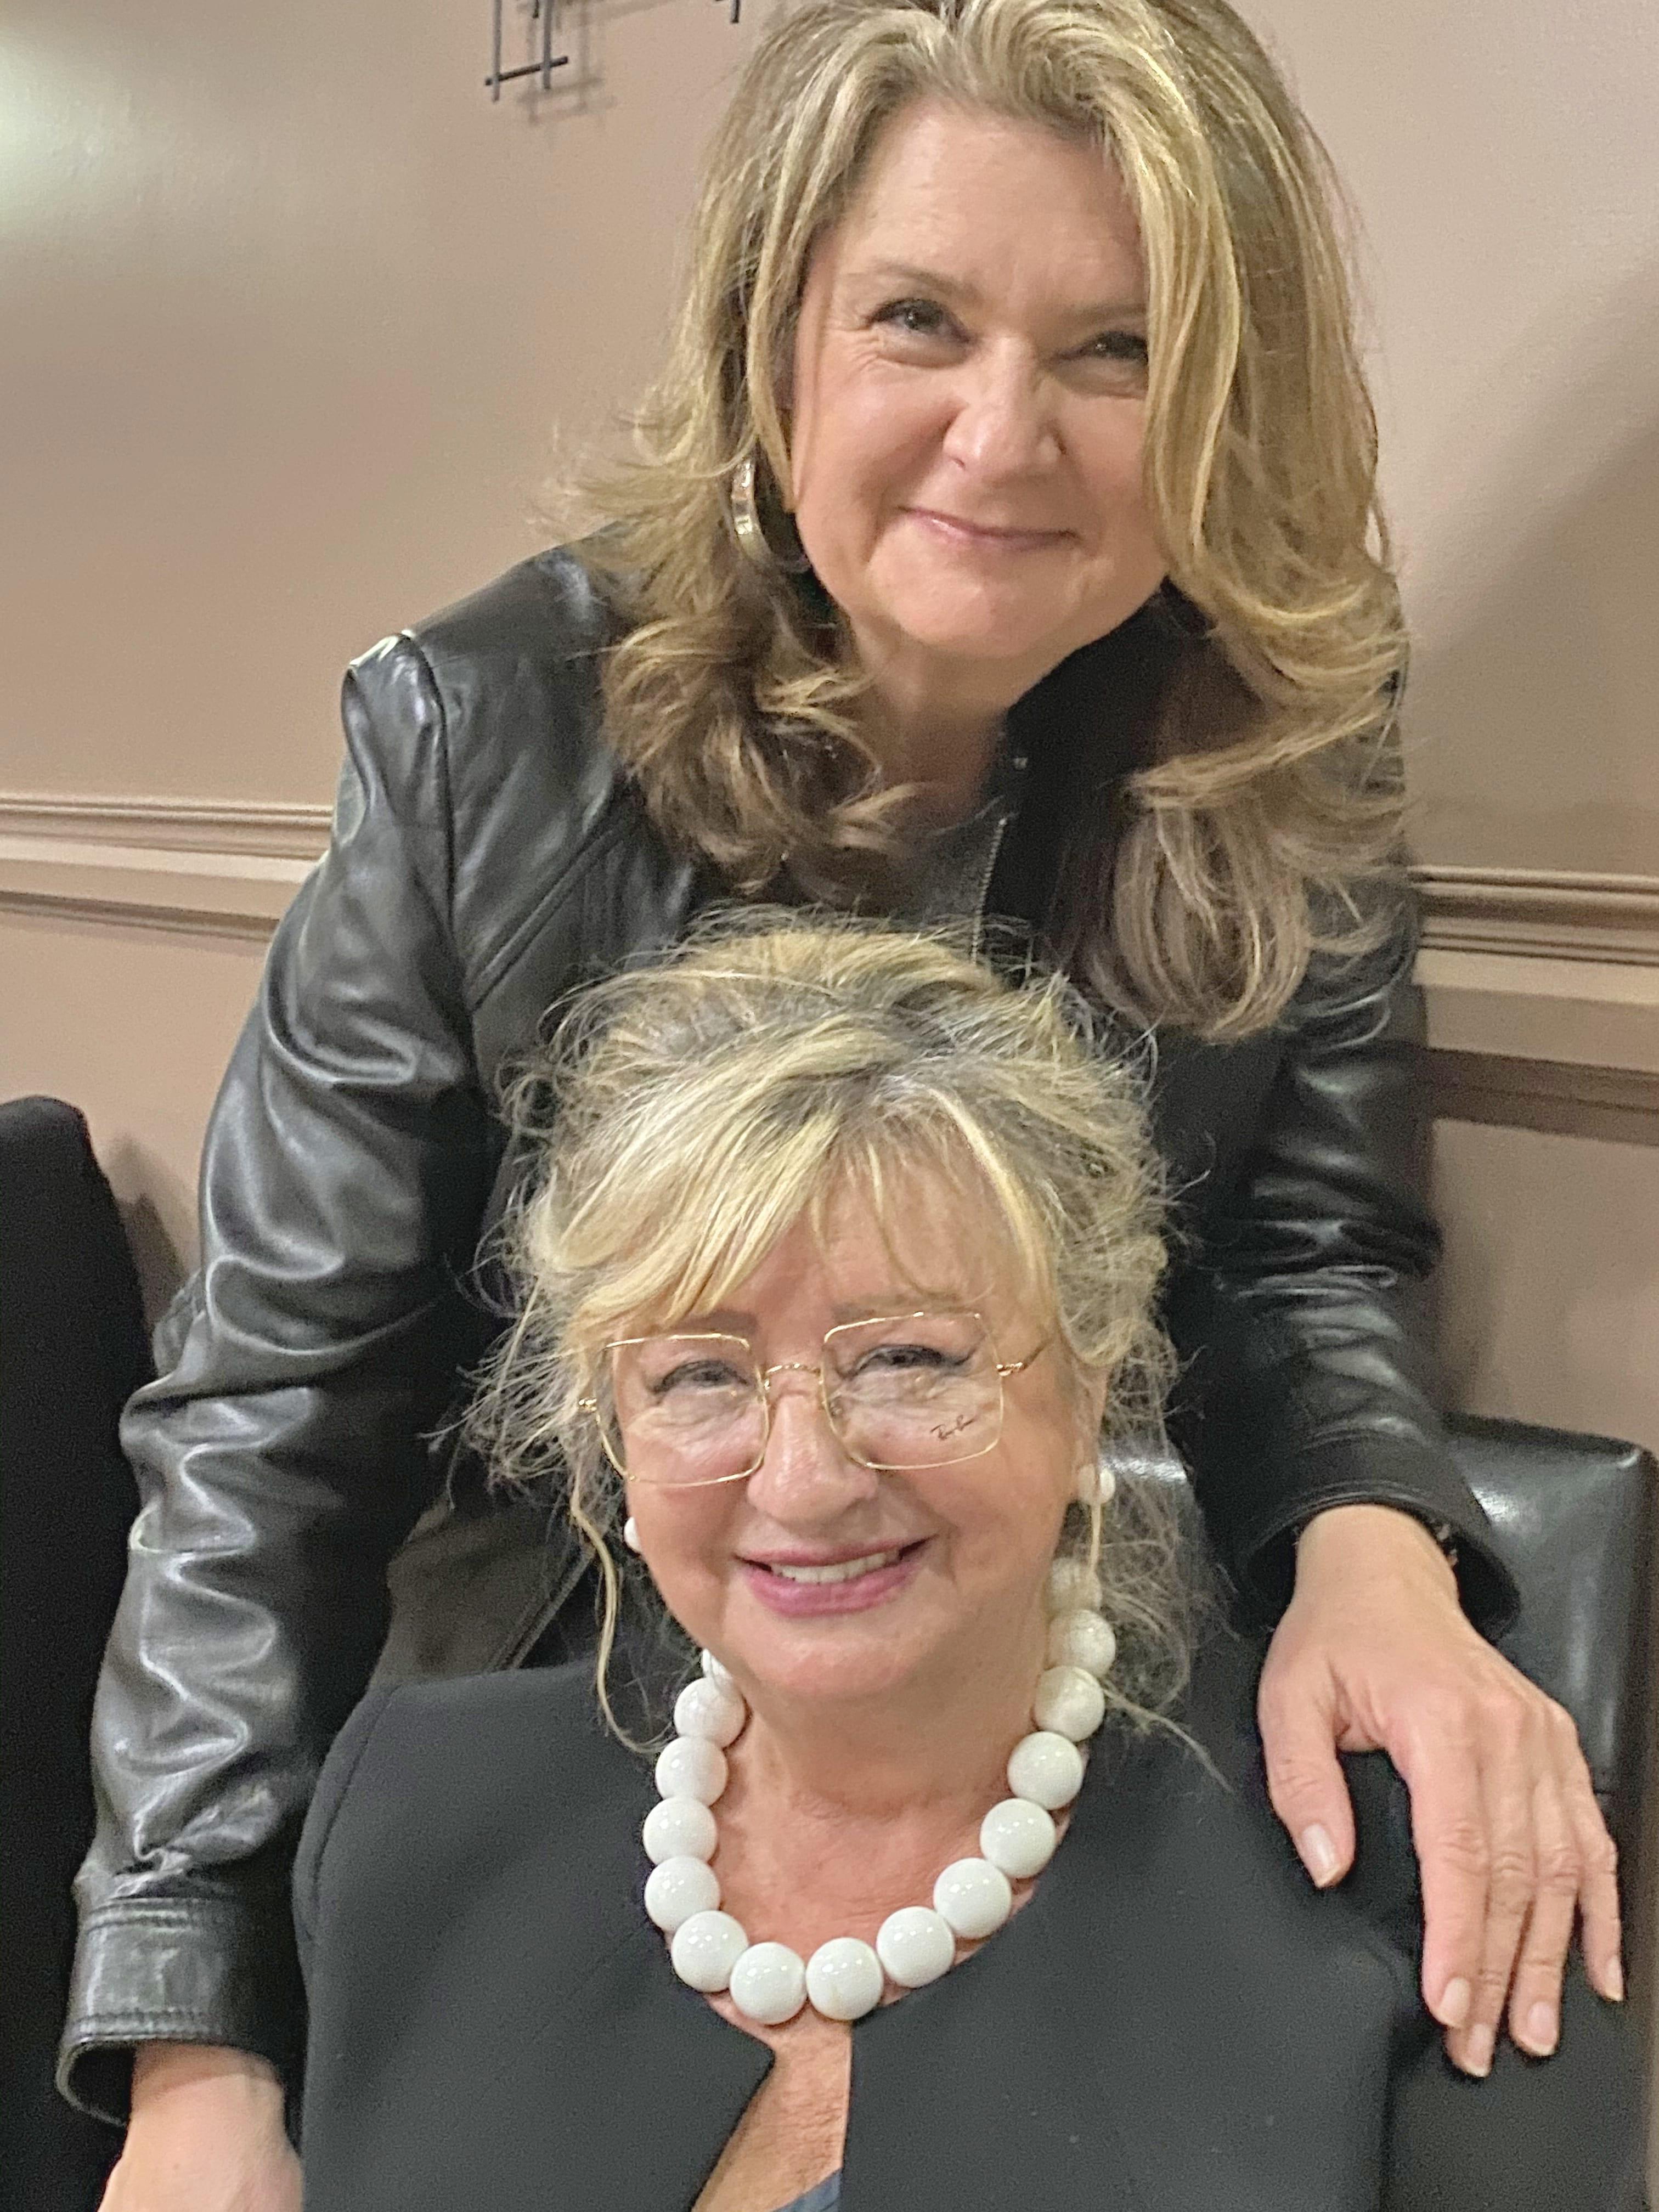 Renata Relyea and her mom Darina Cerny